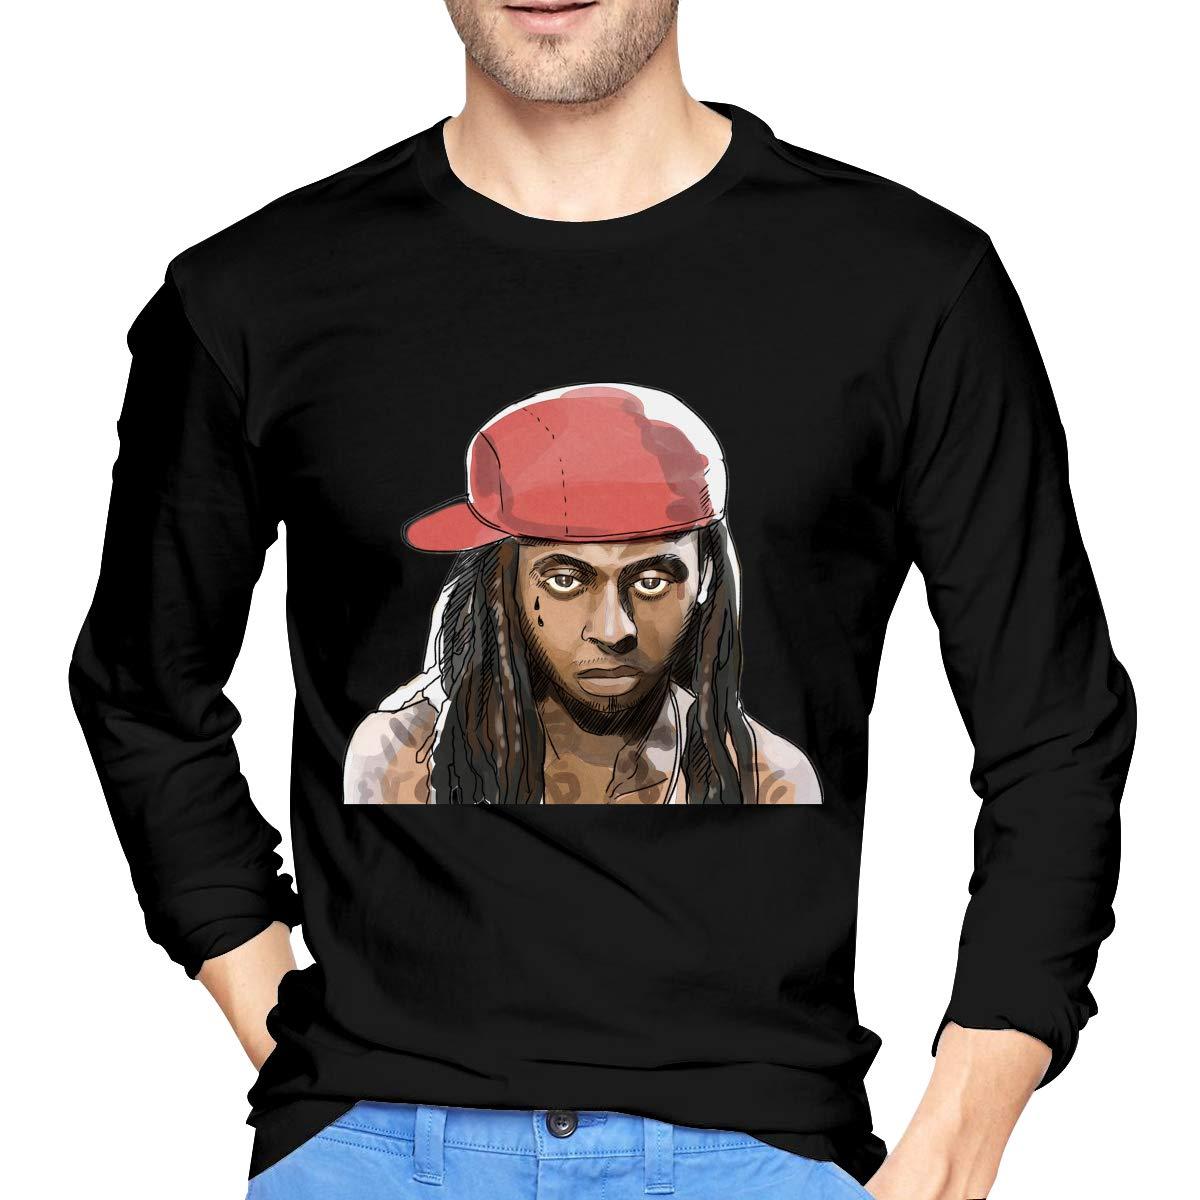 Lihehen Man Lil Wayne Retro Printing Round Neck S Shirts